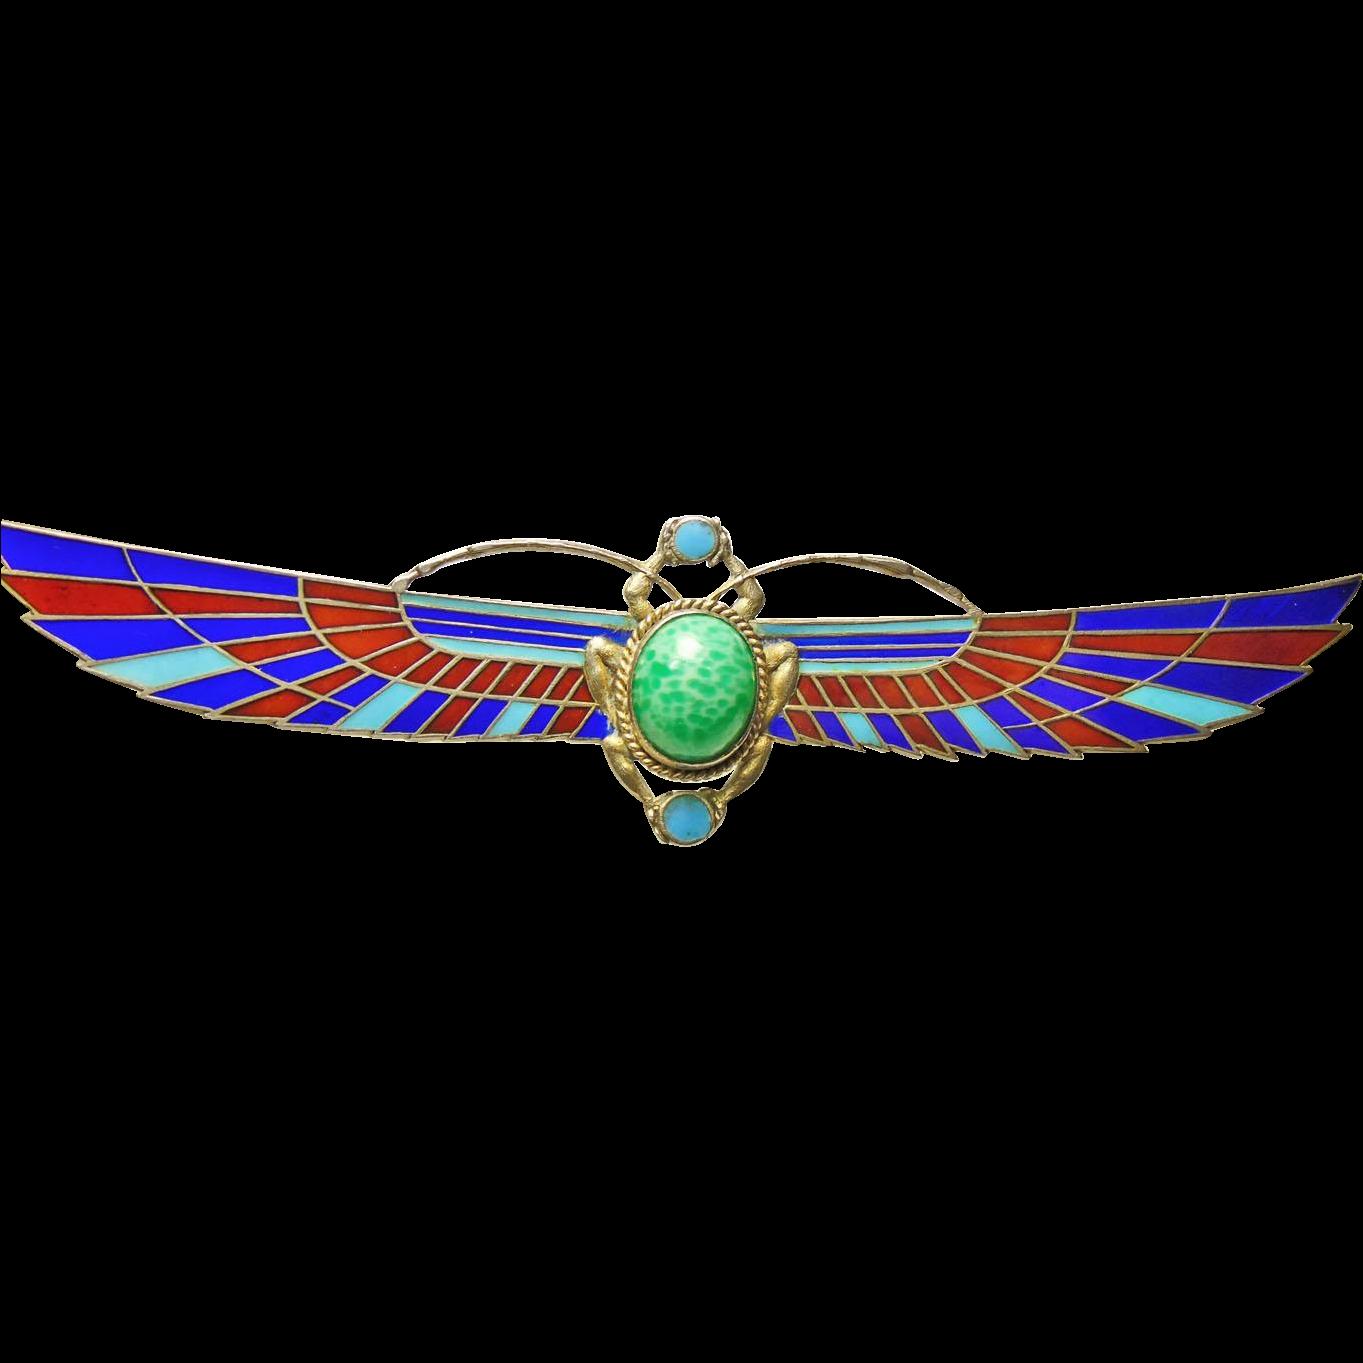 egyptian winged scarab - photo #4